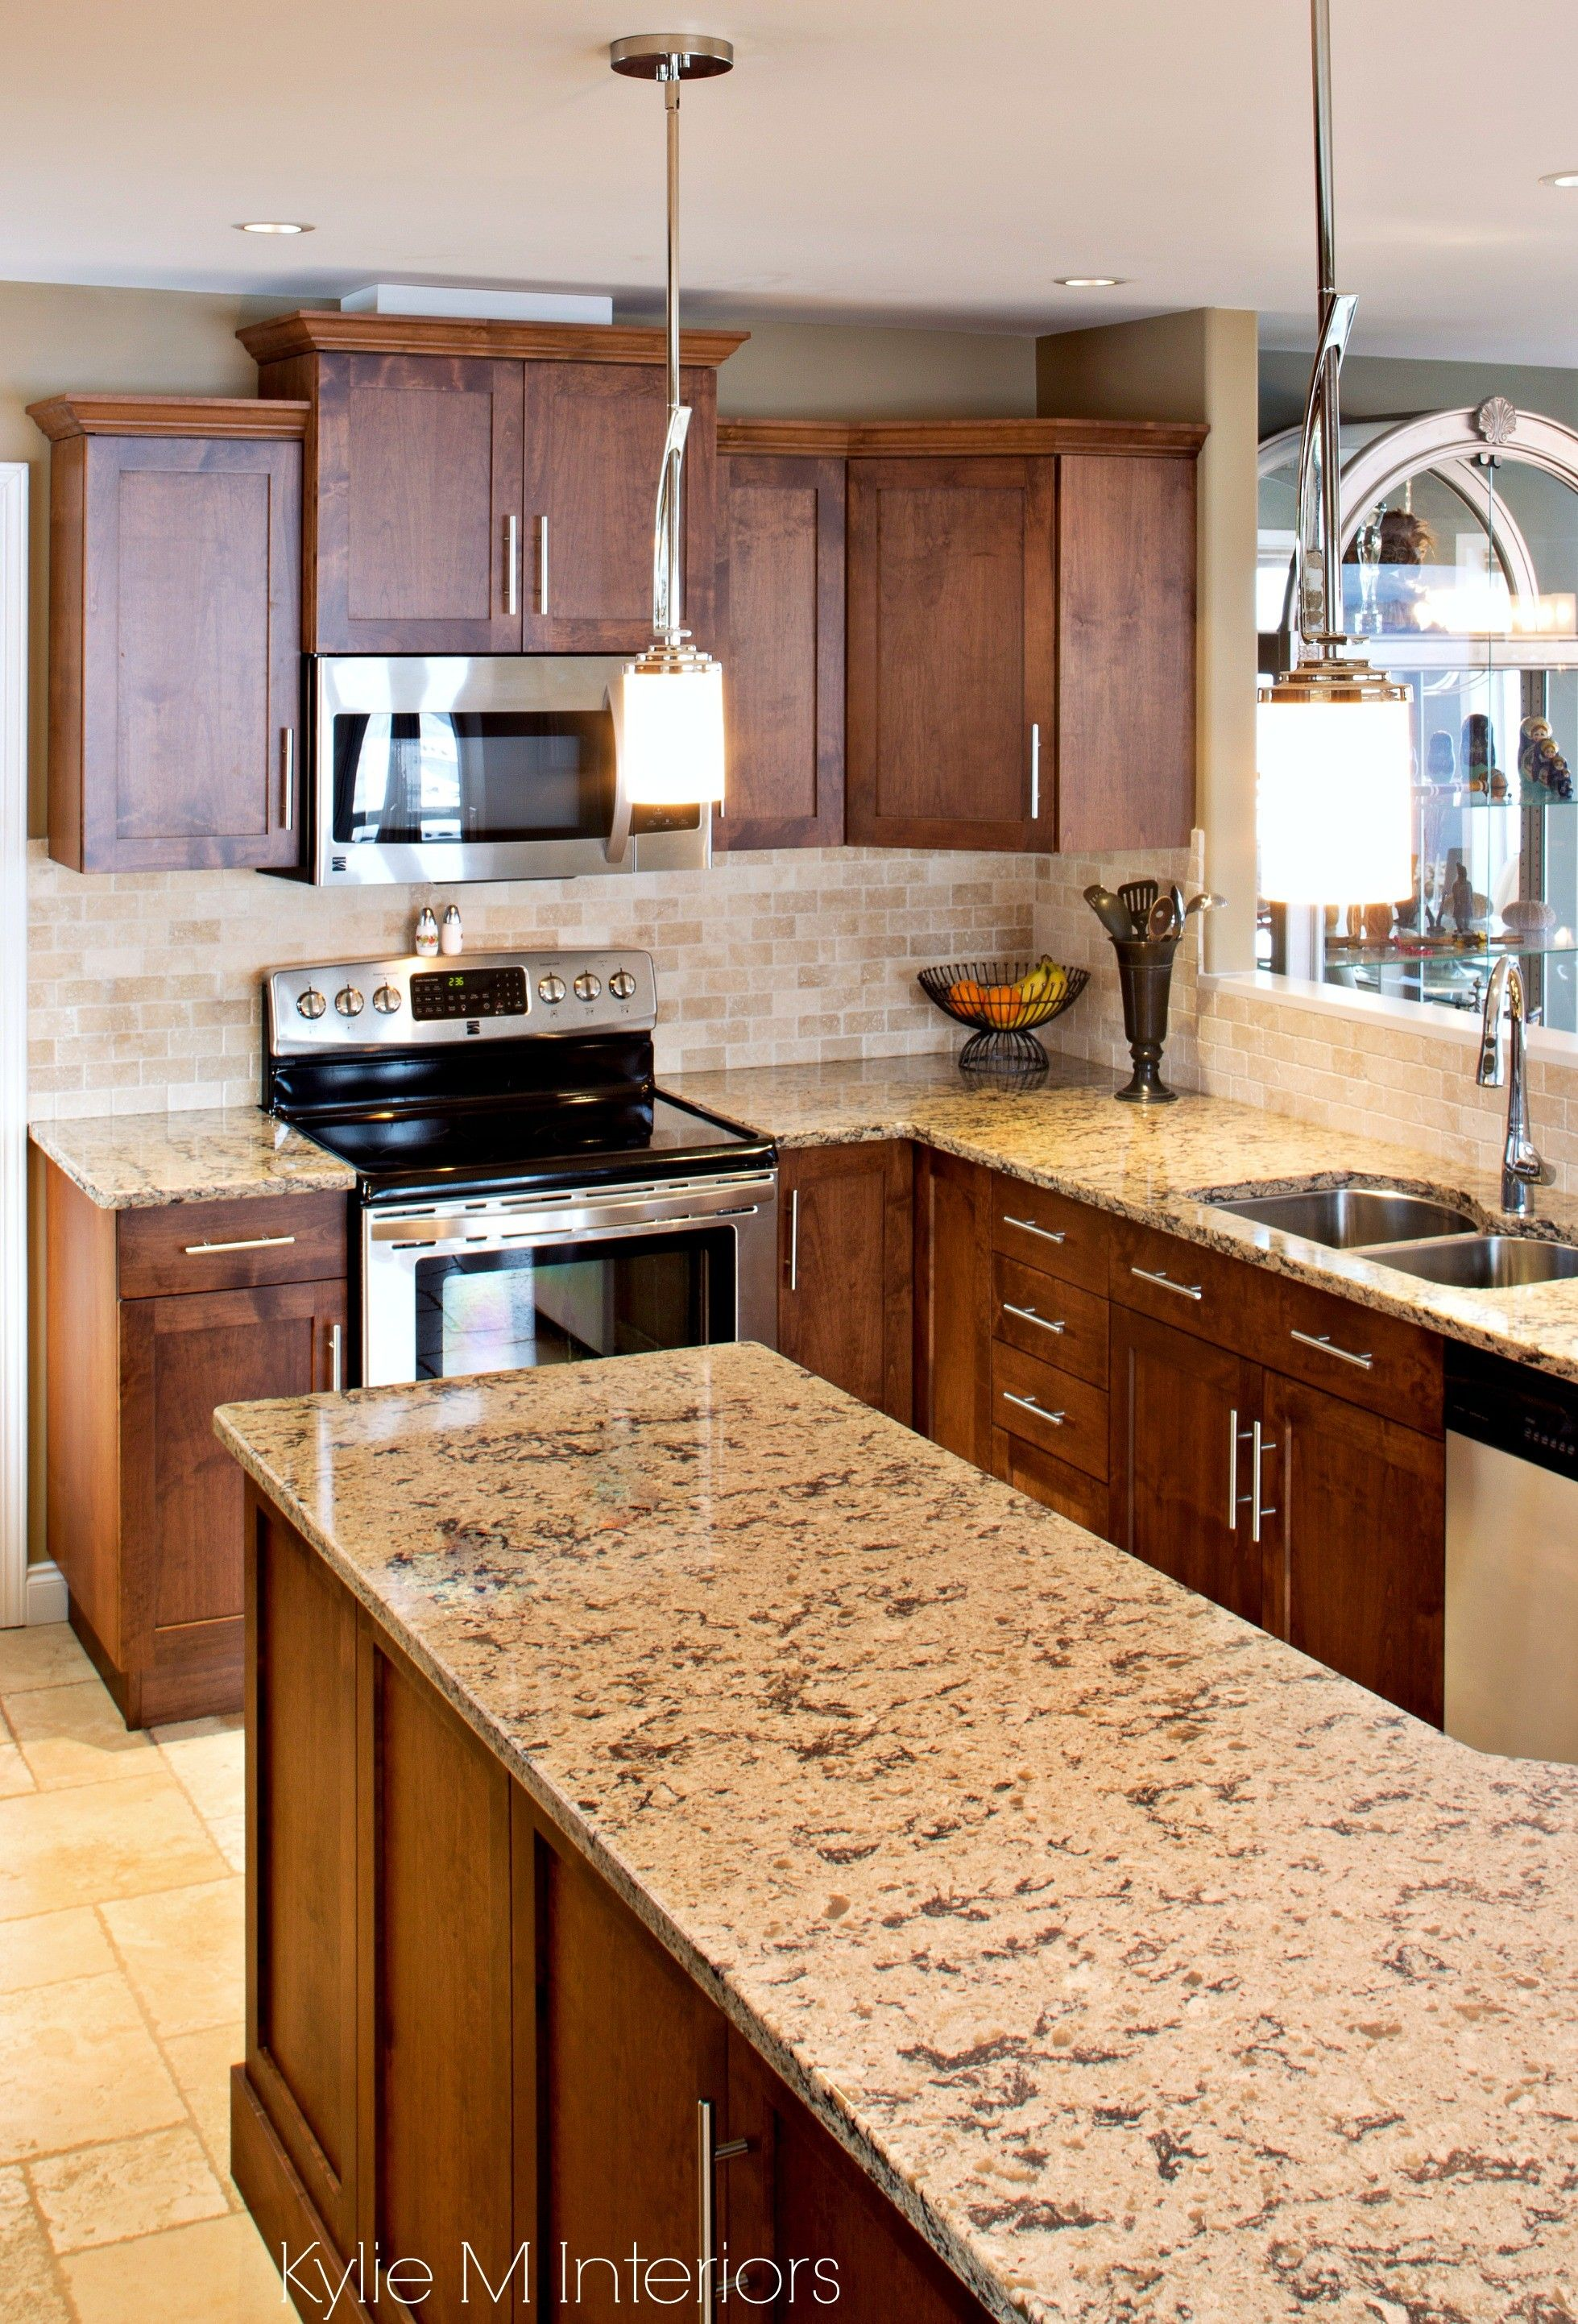 Image result for maple cabinets quartz countertops ... on Maple Kitchen Cabinets With Quartz Countertops  id=71657